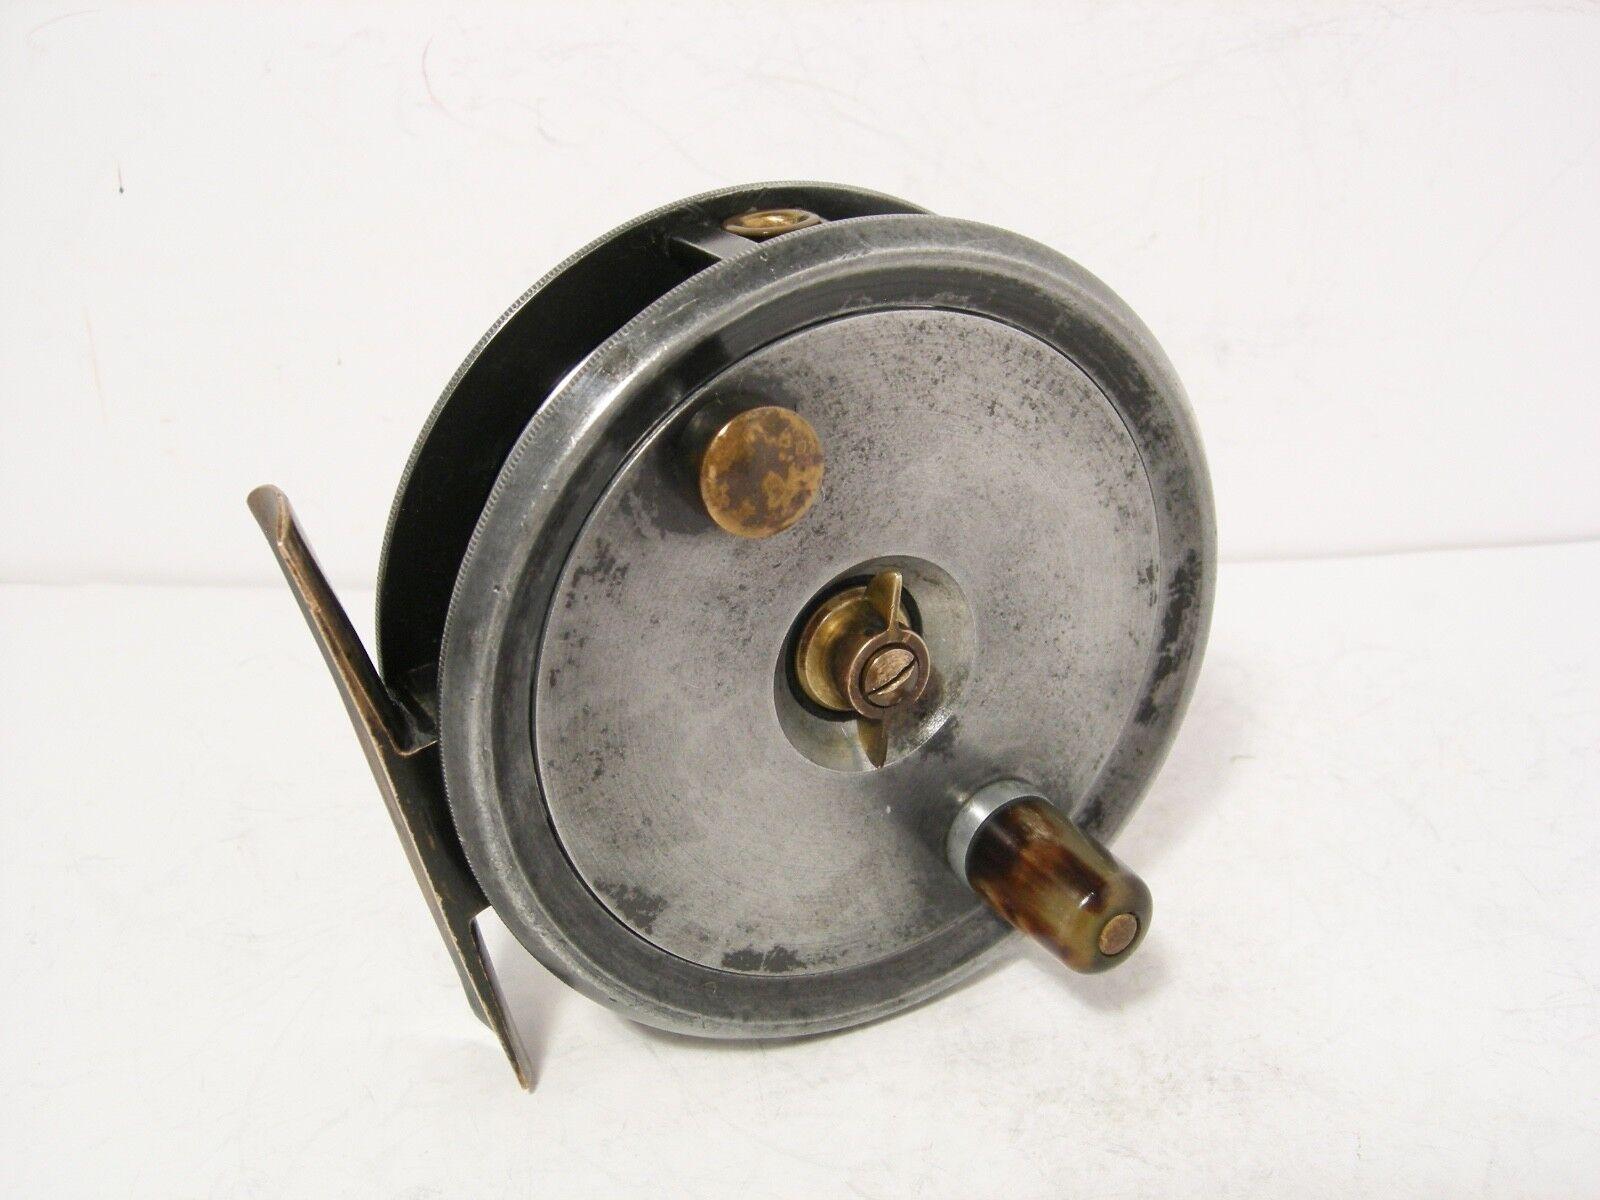 Vintage Antique Fine Reuben Heaton 3 ⅝  Alloy Fly Fishing Reel